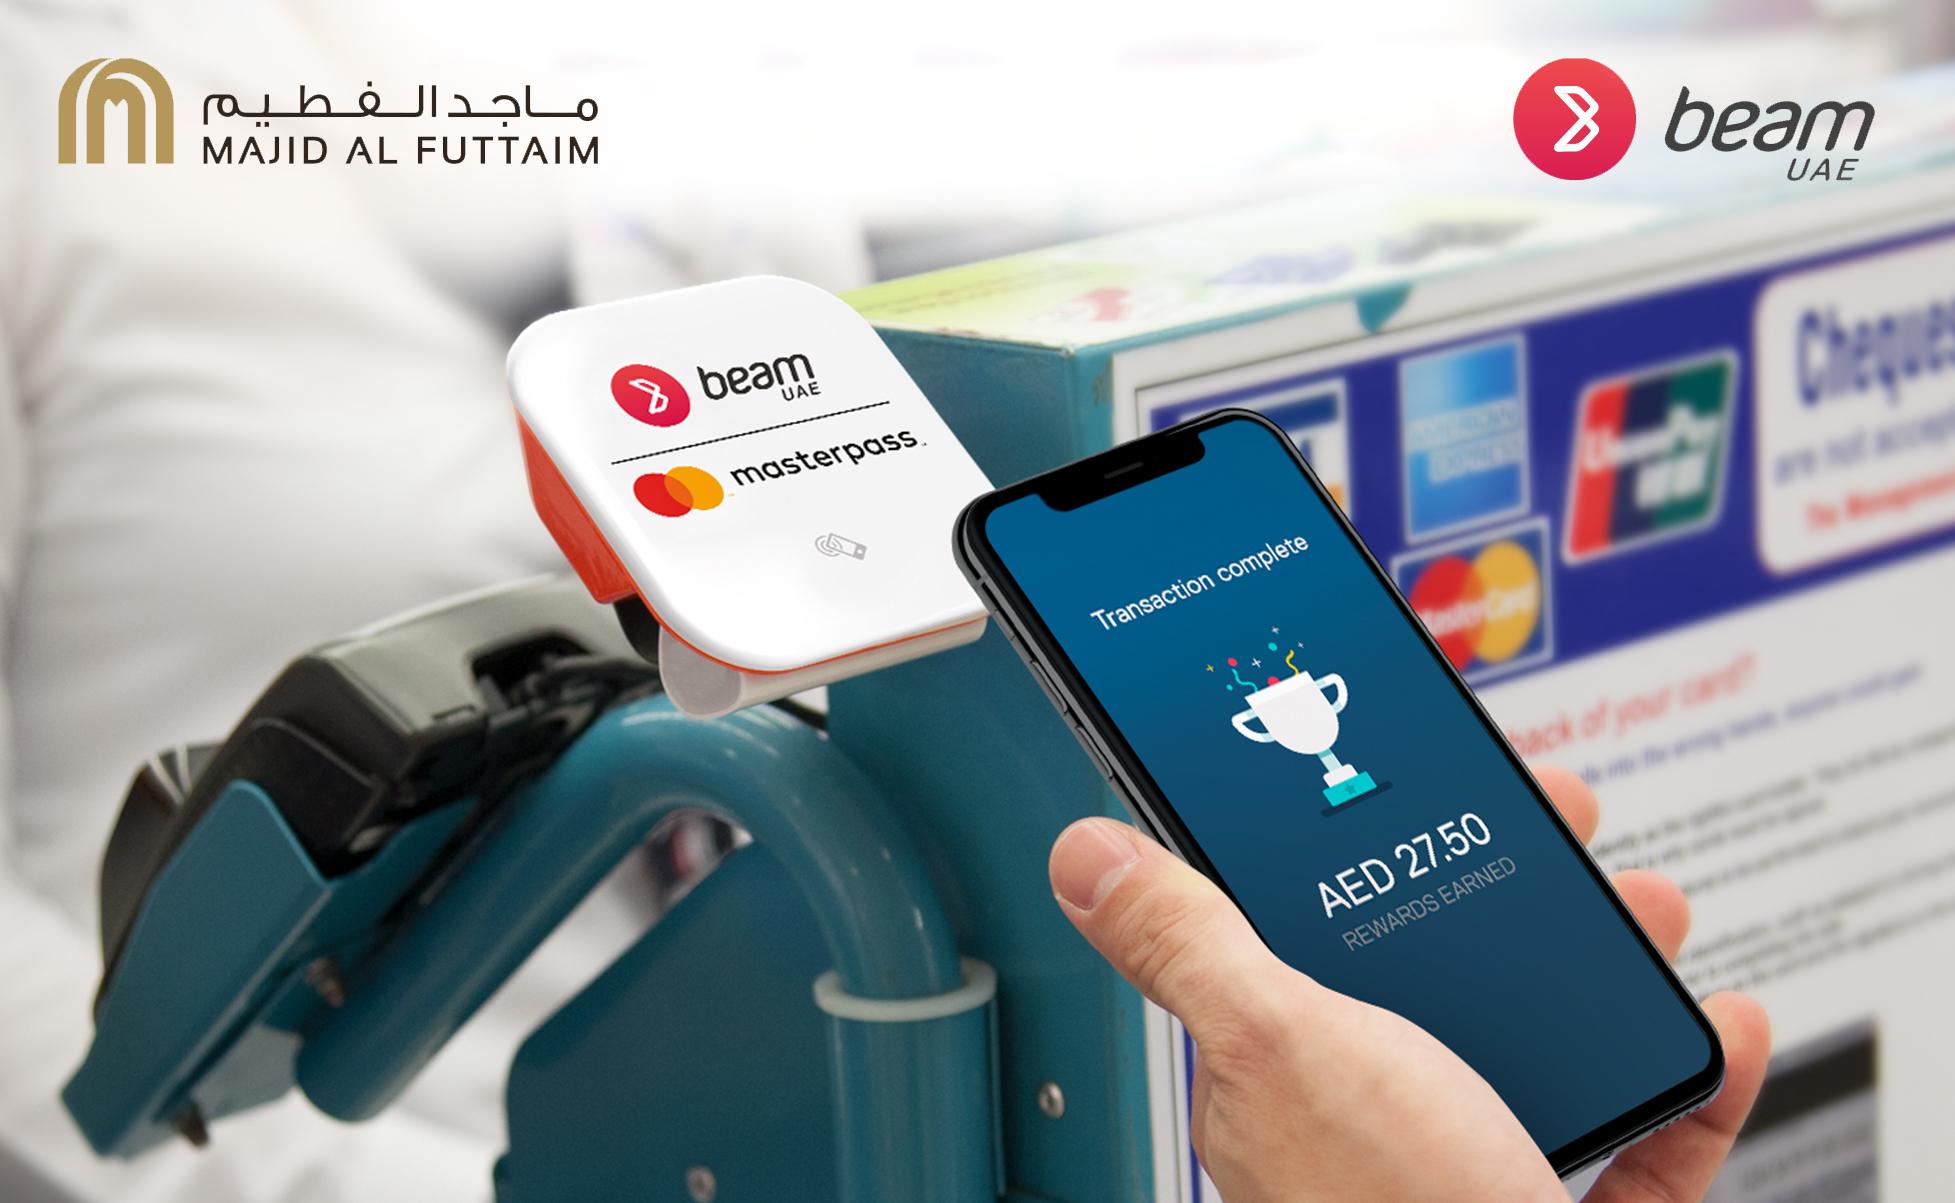 majid al futtaim acquires uae27s leading mobile wallet app